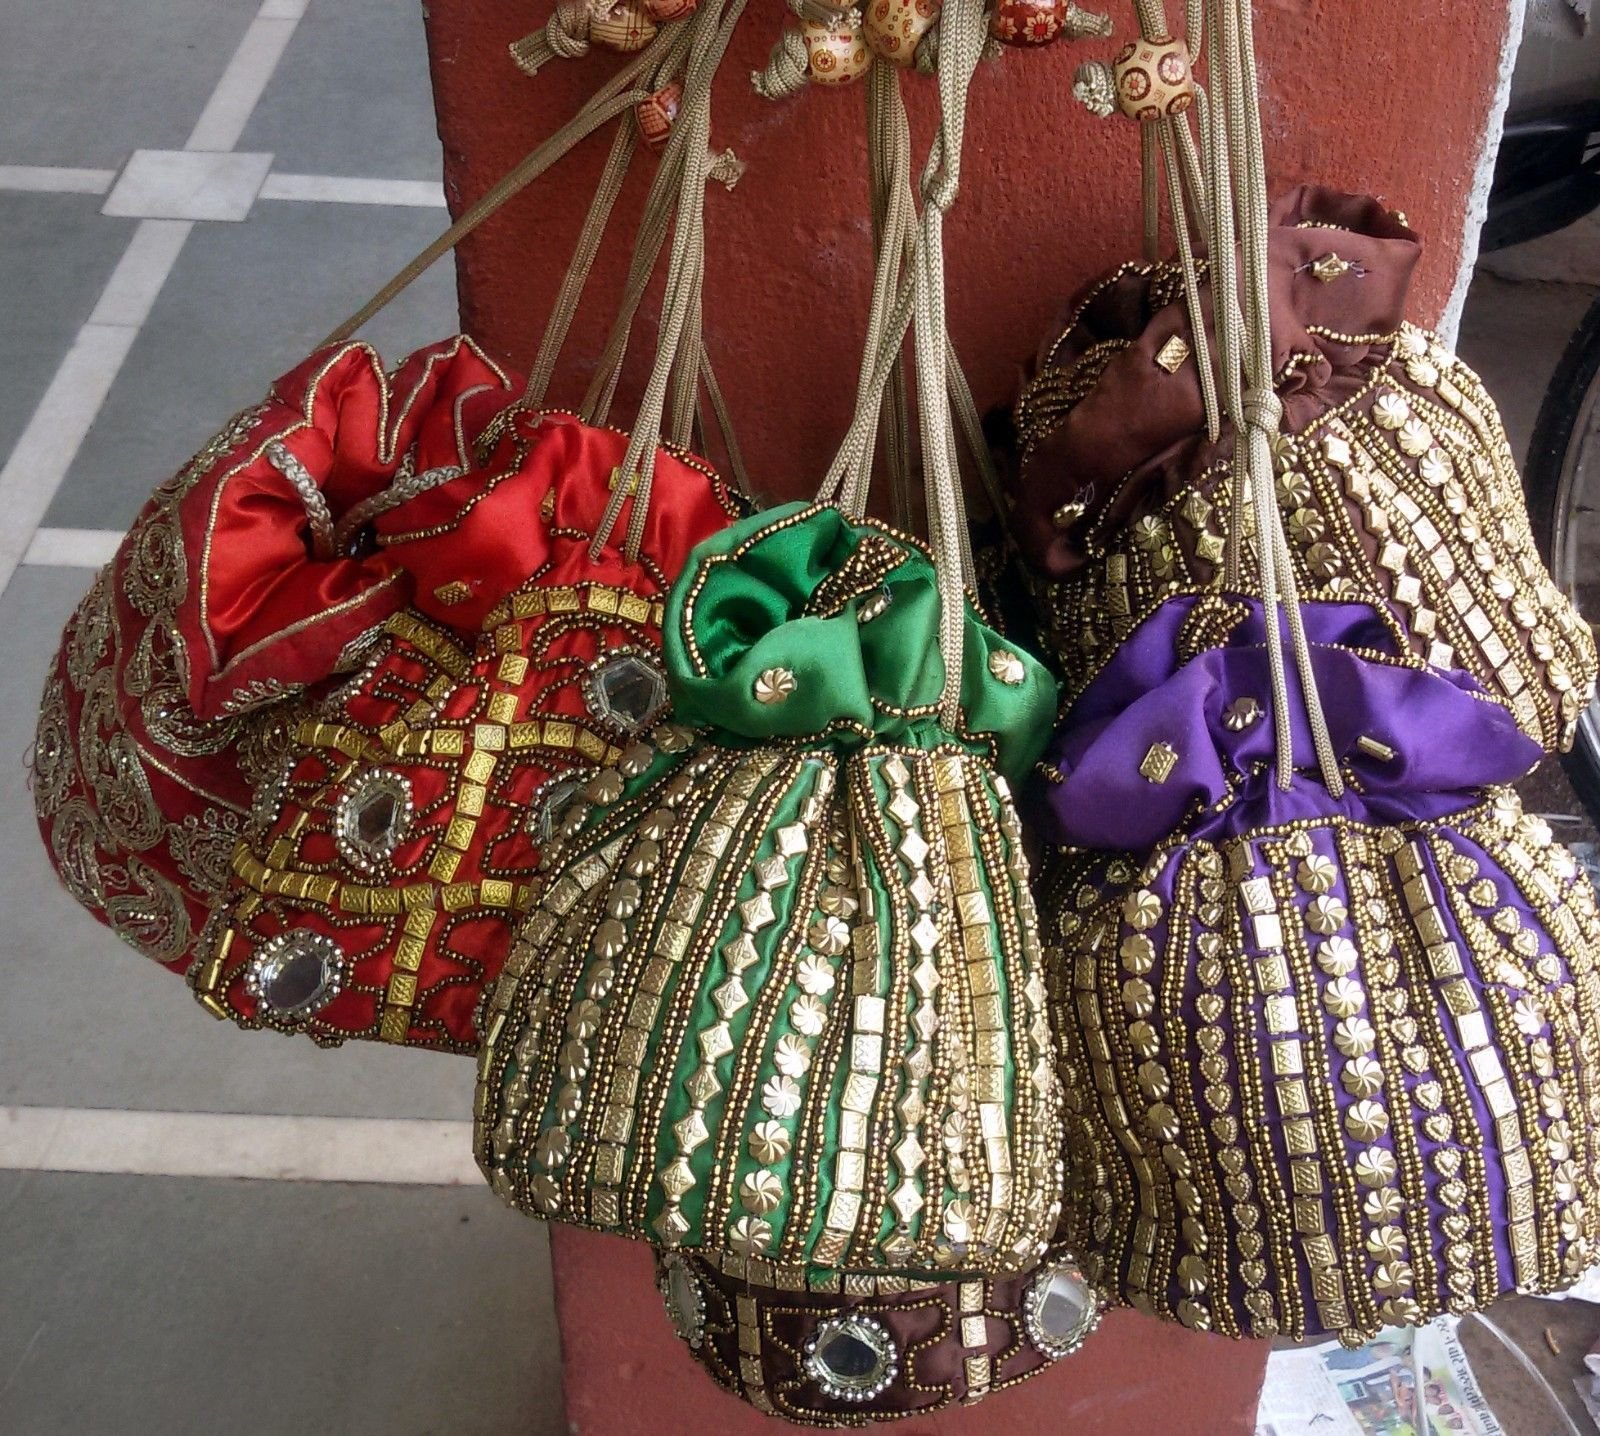 Dadu_creation 50 pc wholesale lot of Handmade party Potli Hand Bag Women Clutch Purse Designer